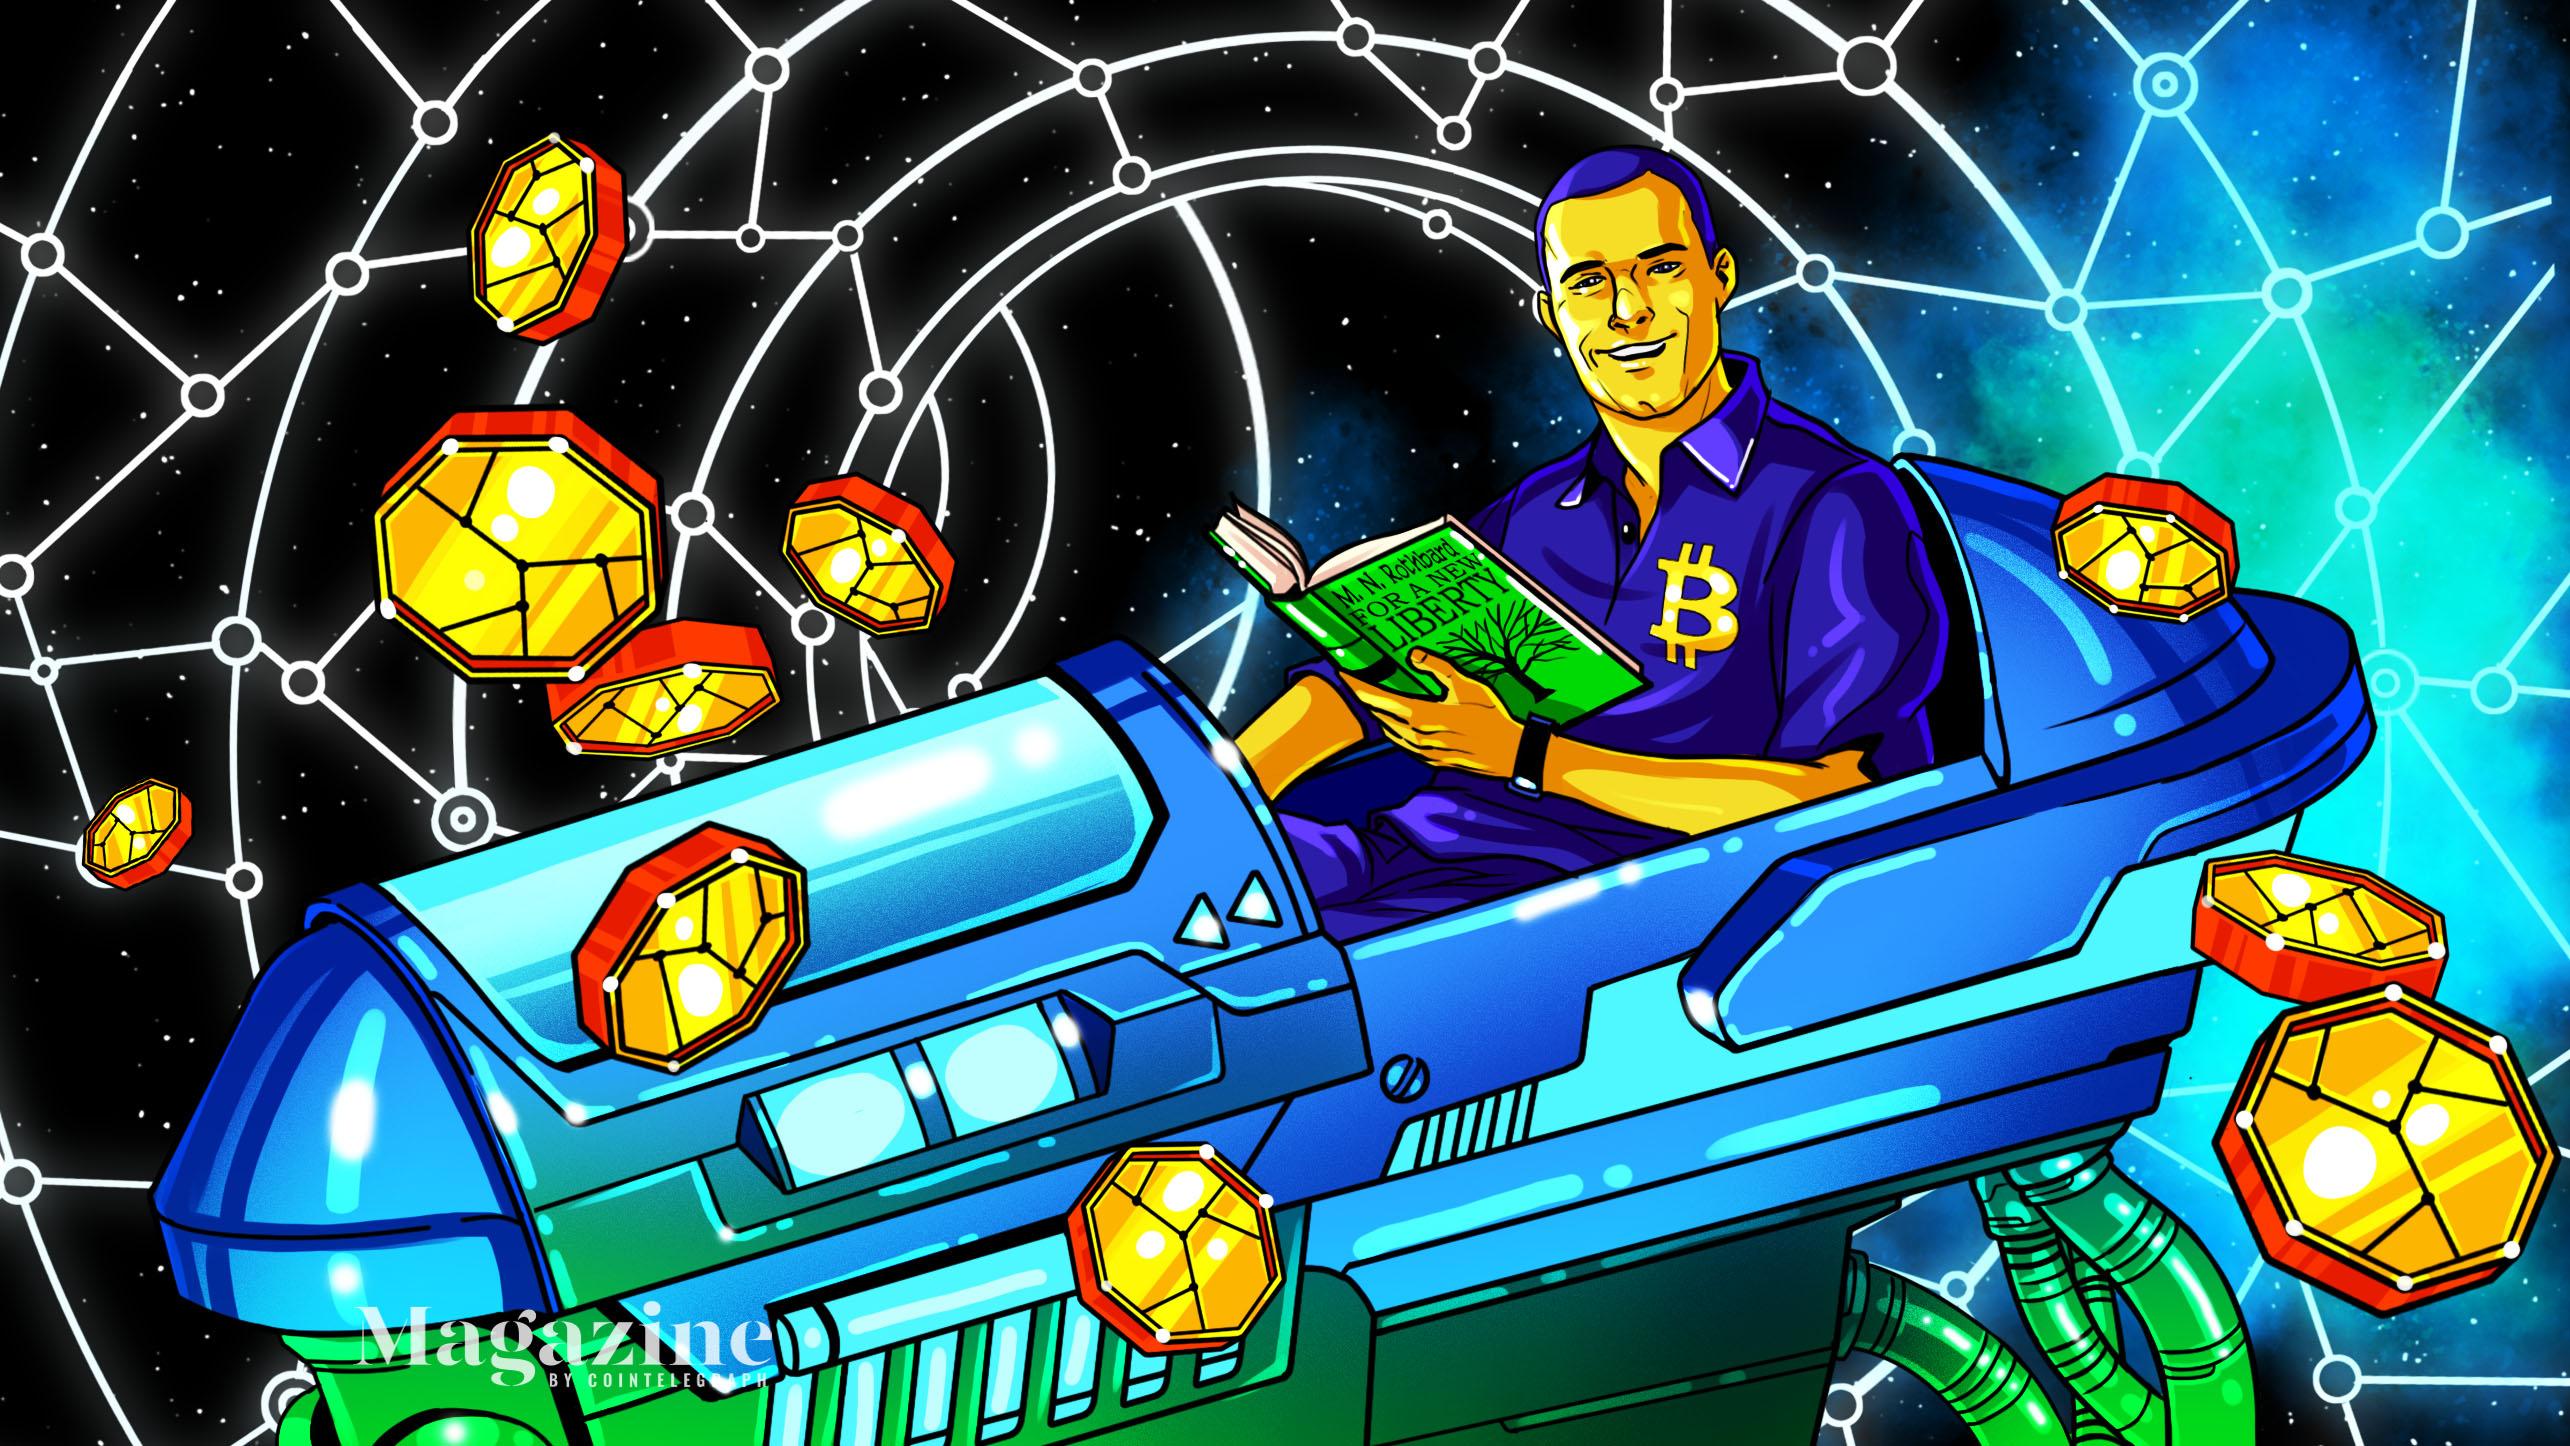 Roger Ver's next life: Cryonics meets crypto – Cointelegraph Magazine